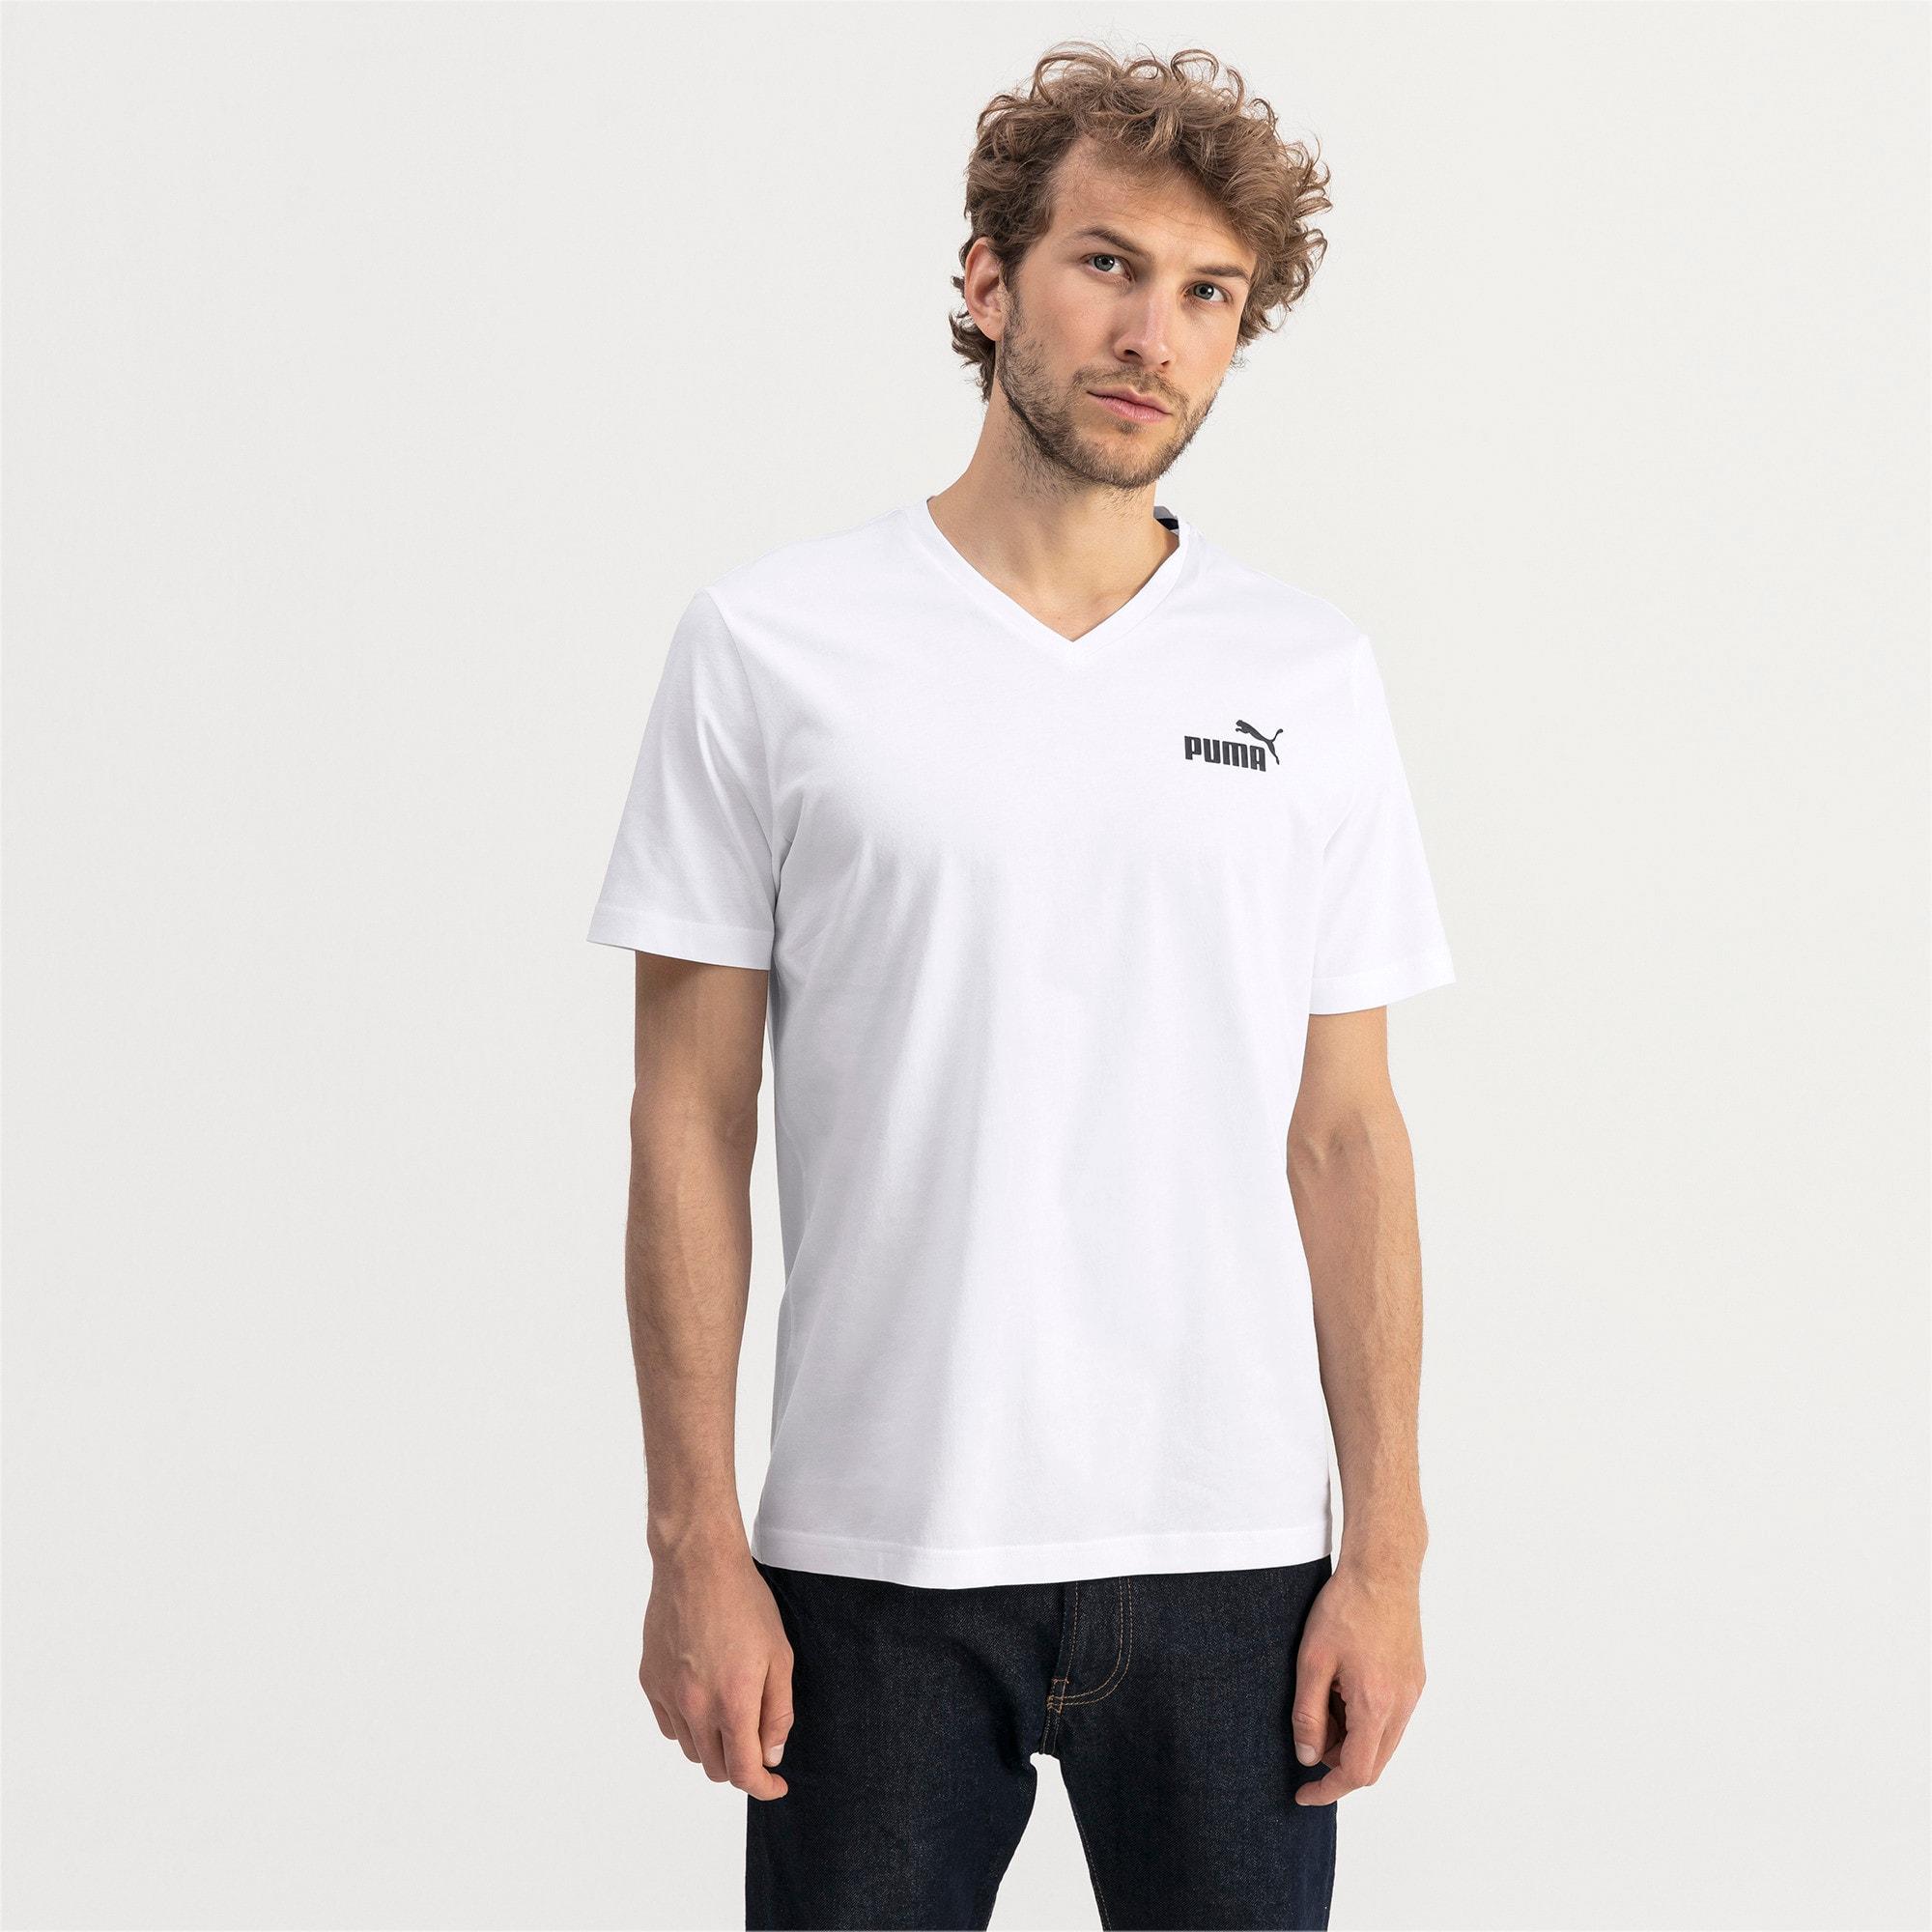 Thumbnail 1 of T-shirt con scollo a V Essentials uomo, Puma White, medium